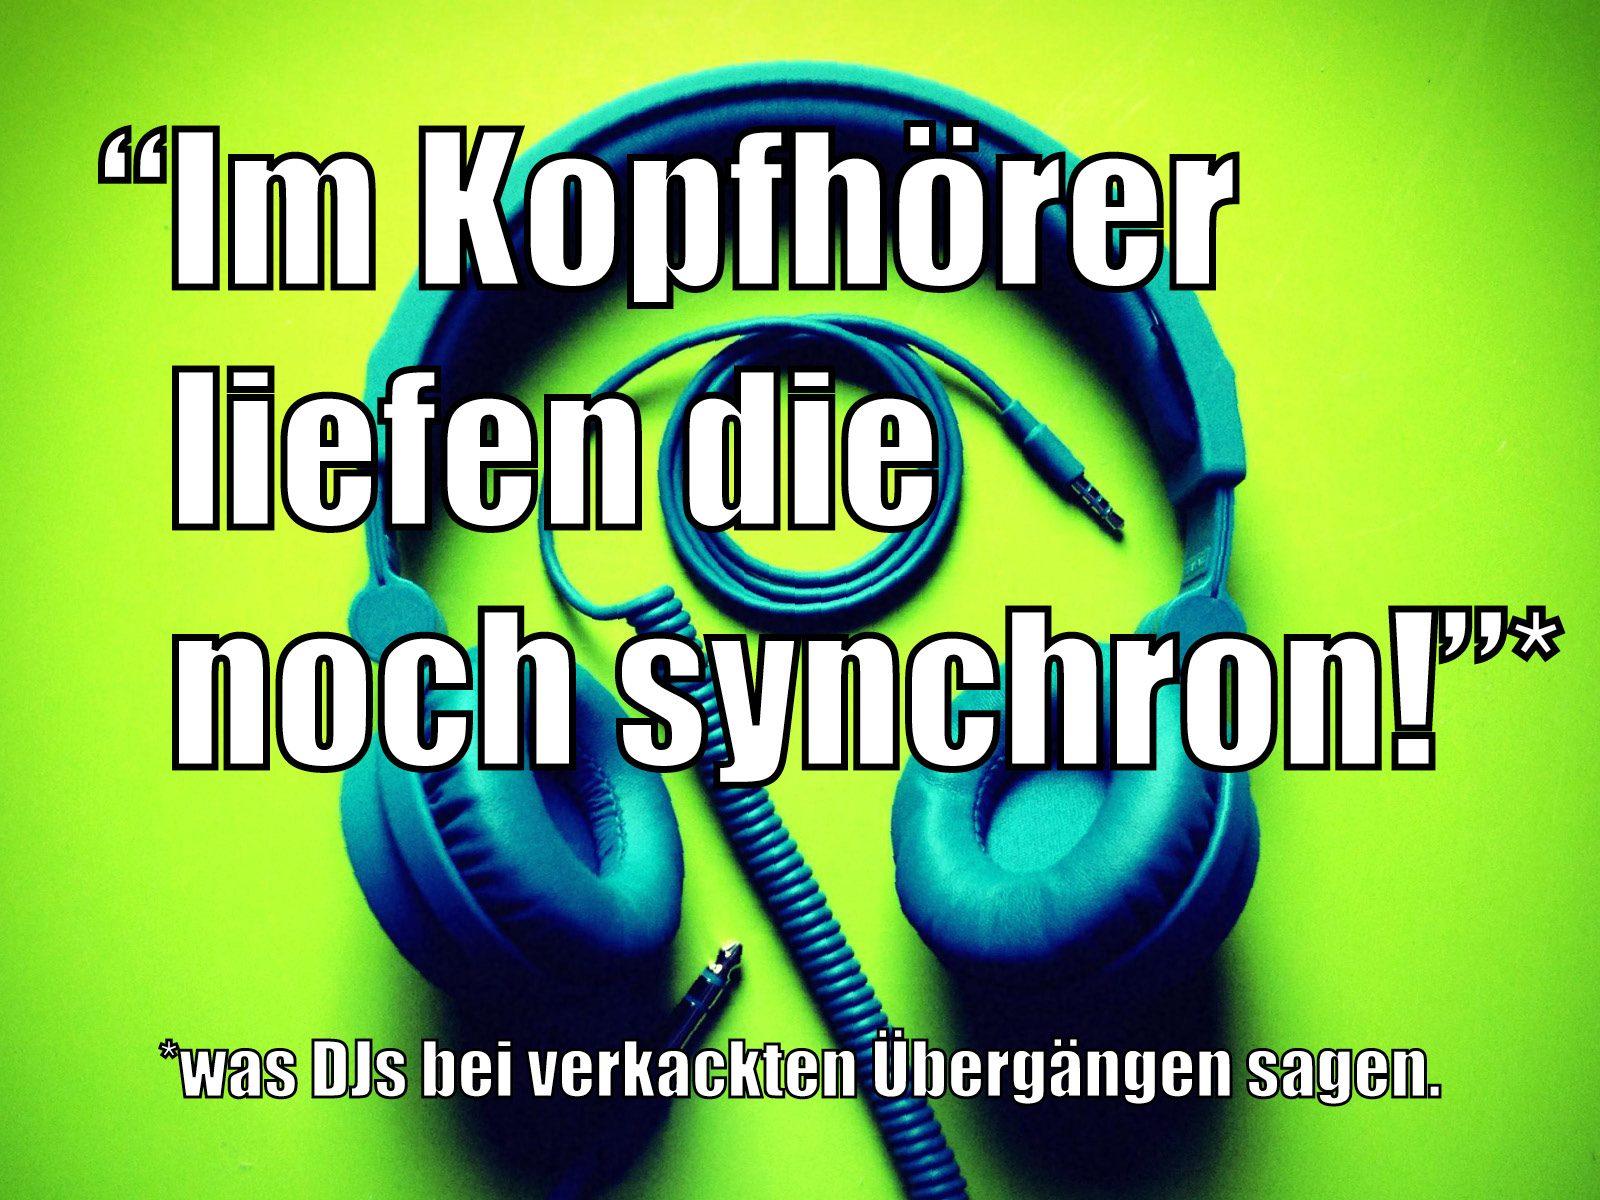 Urban Ears Kopfhörer mit Zitat drüber